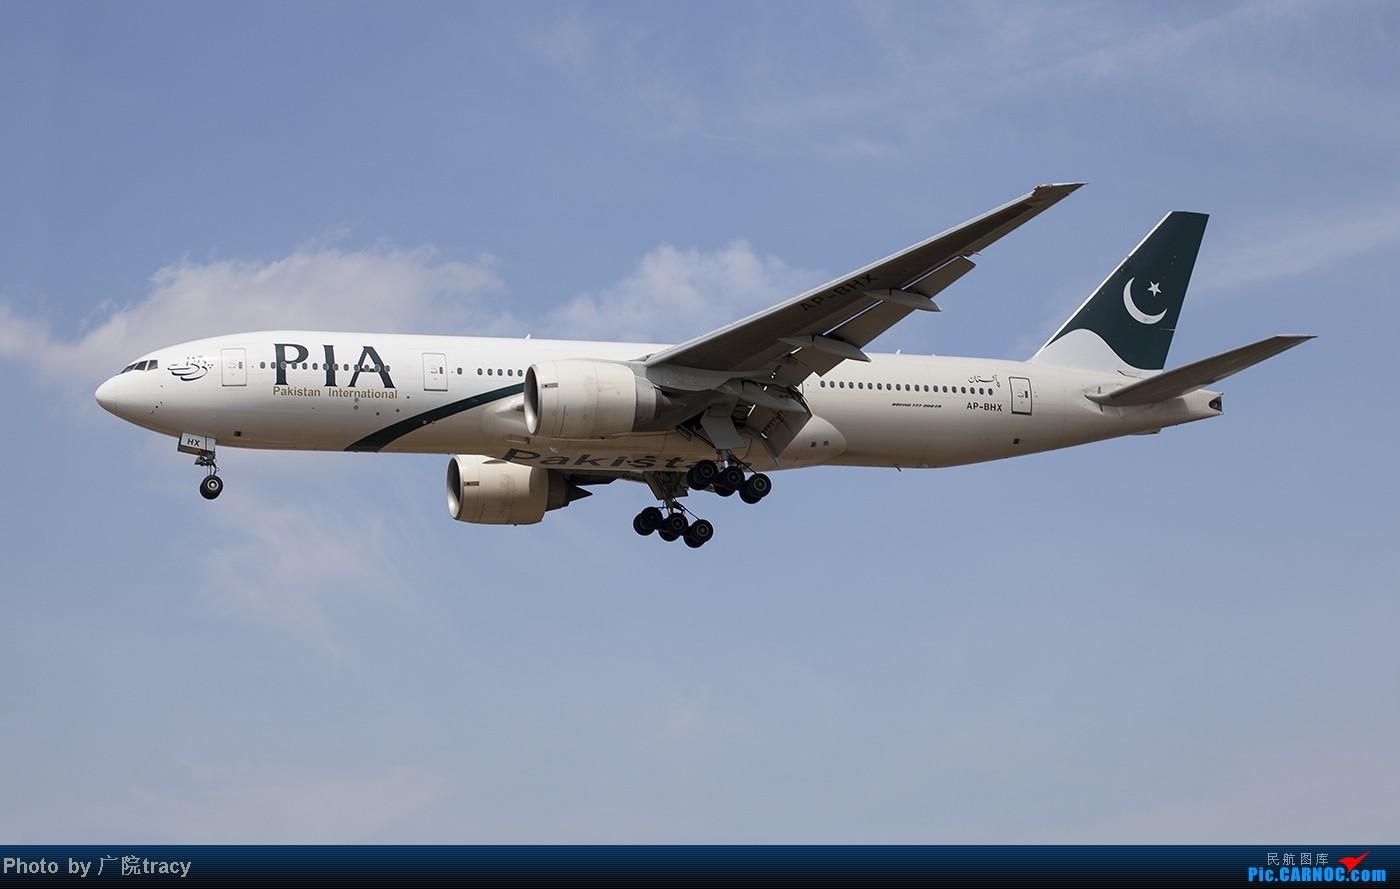 Re:[原创]★ ★ ★ ★ ★中东的航空公司在伦敦希斯罗国际机场  ★ ★ ★ ★ ★ BOEING 777-200ER AP-BHX 英国伦敦希思罗机场